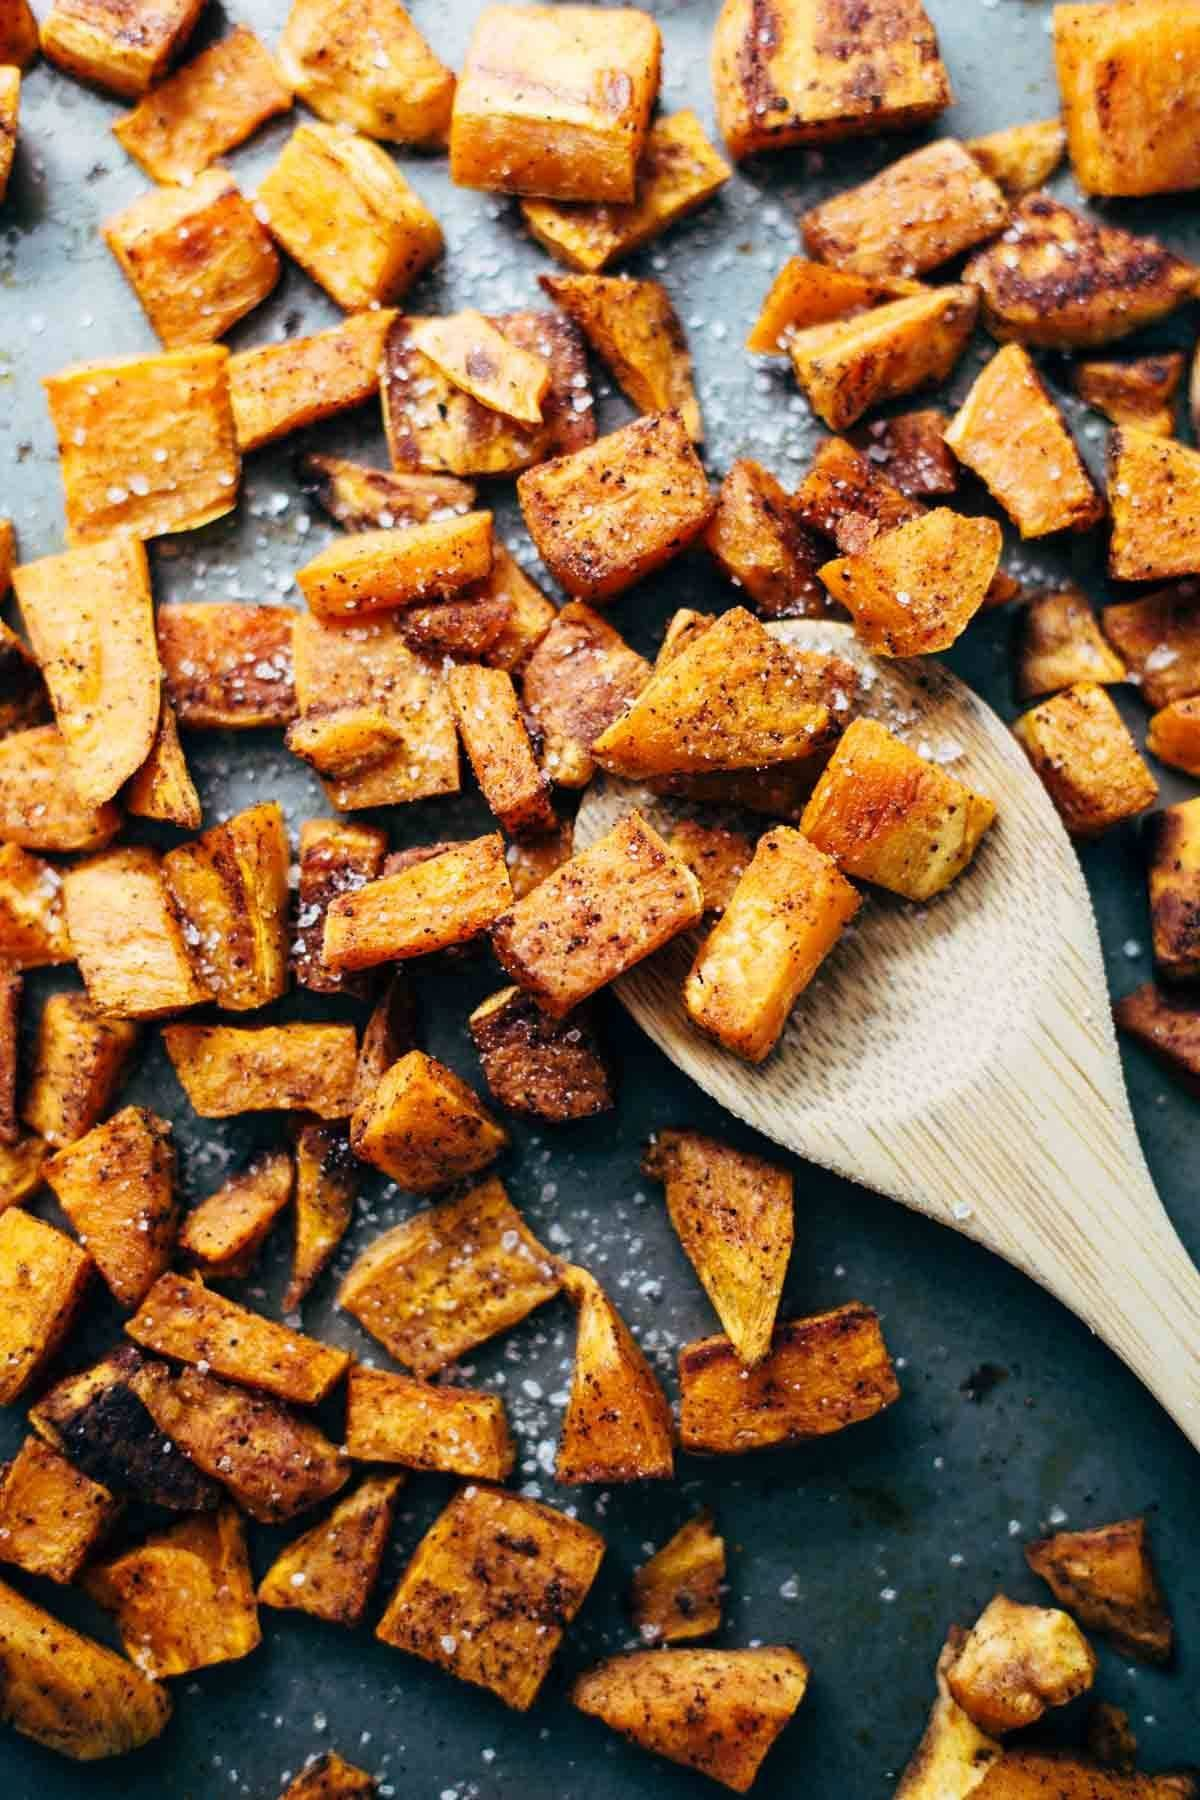 Roasted Sweet Potatoes for Southwestern Salad